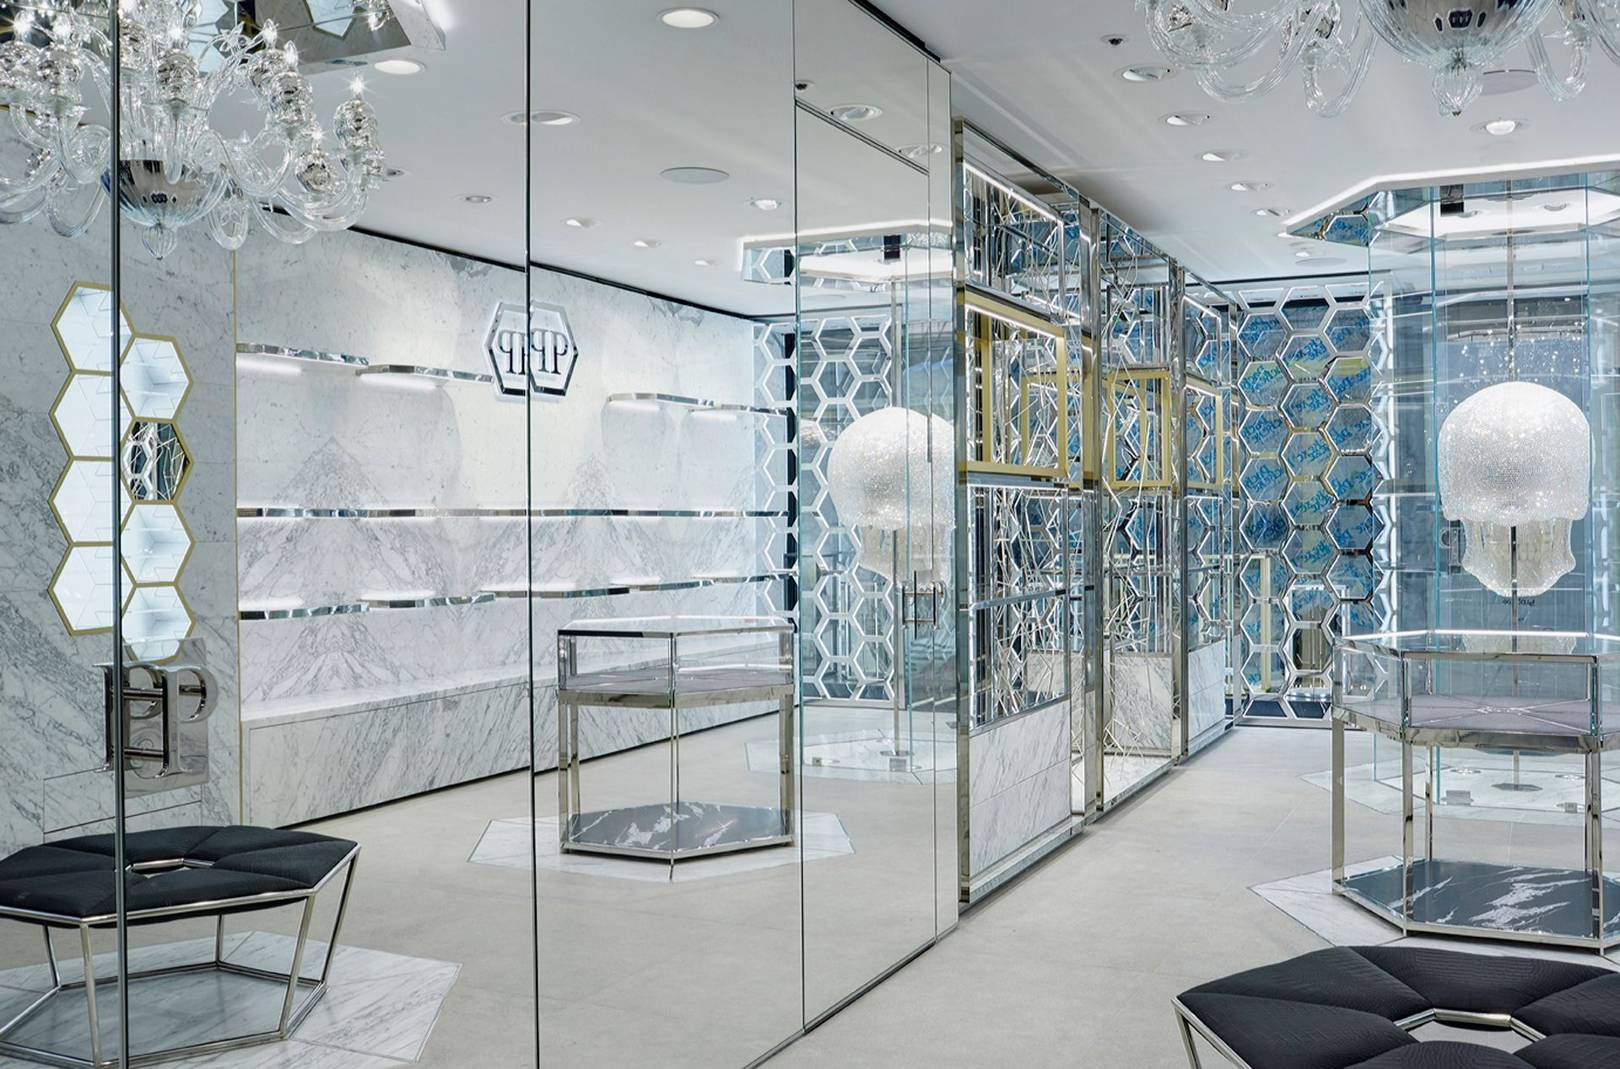 b47db0fcac2 Philipp Plein just opened London's brightest, ballsiest flagship store    British GQ